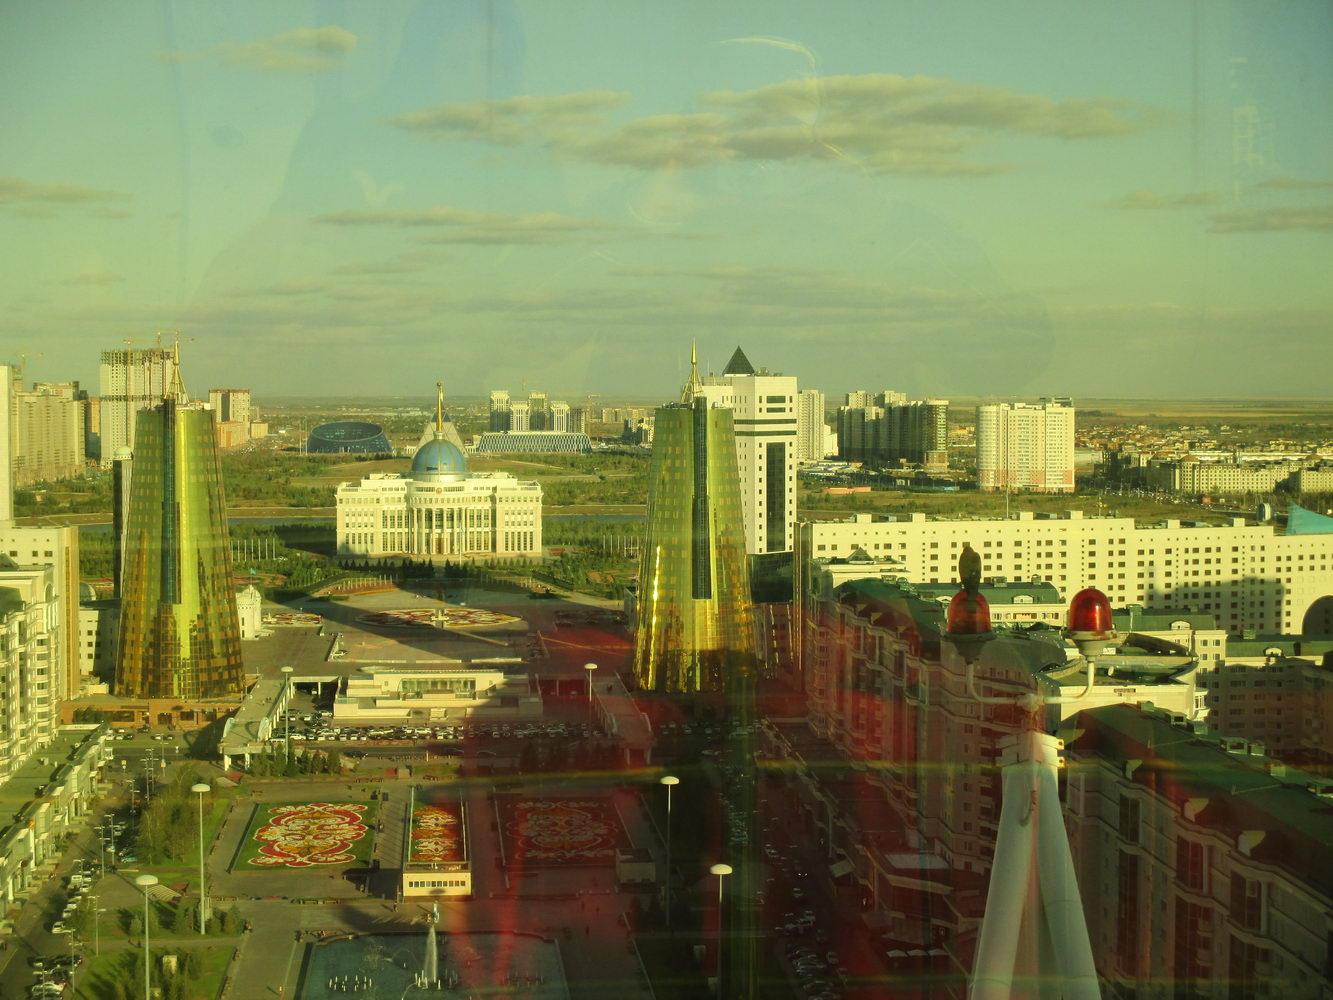 байтерек внутри. астана вид сверху. символ казахстана